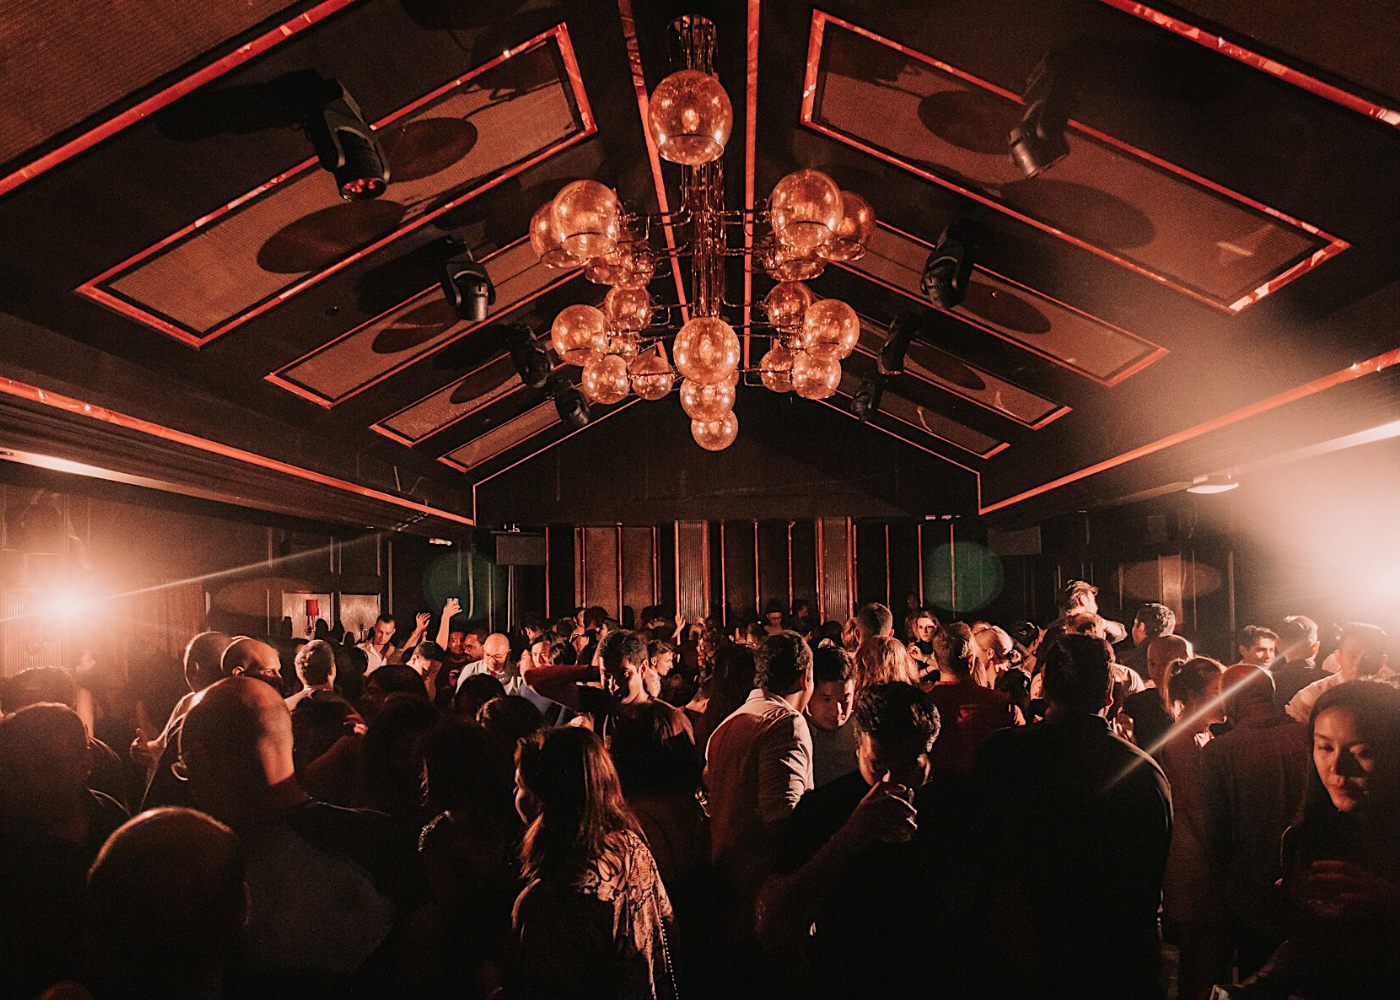 avenue lounge nightclub